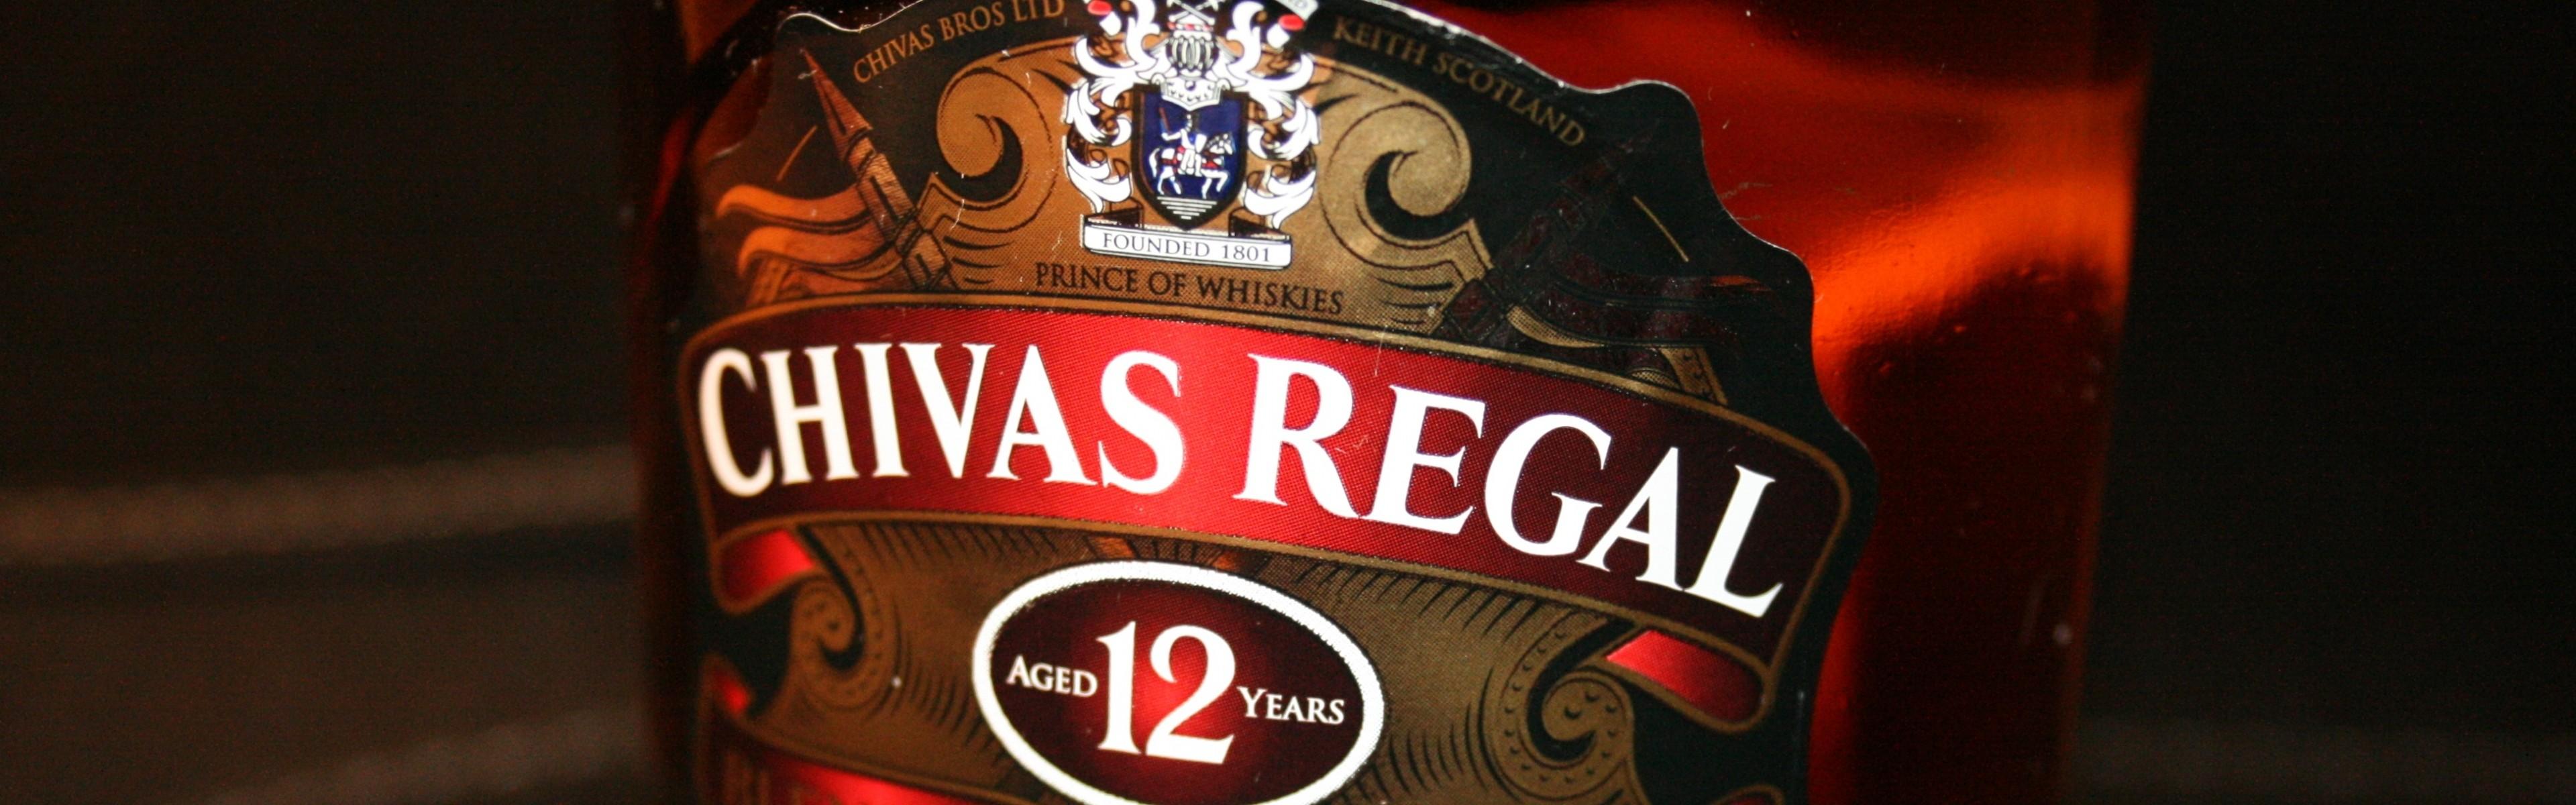 Chivas Wallpaper HD 73 images